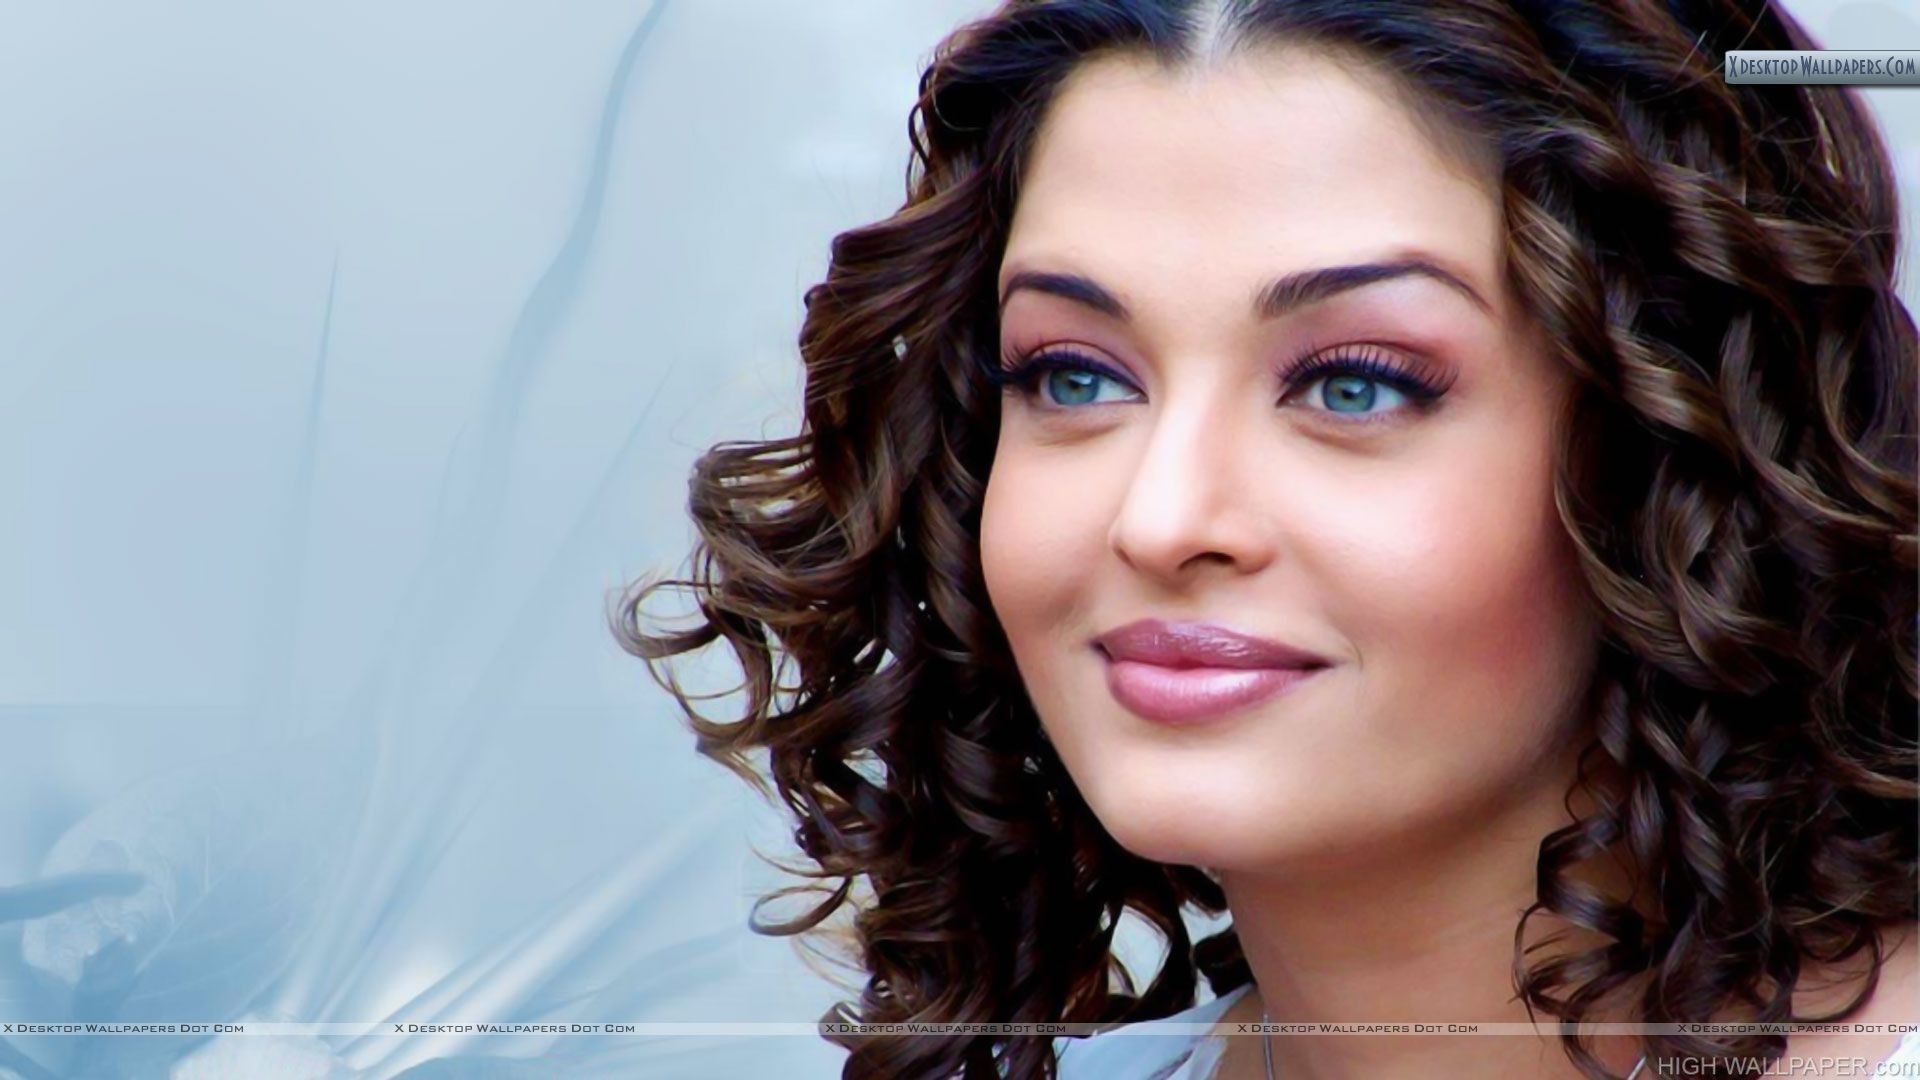 Aishwarya Rai Pink Lips And Smiling